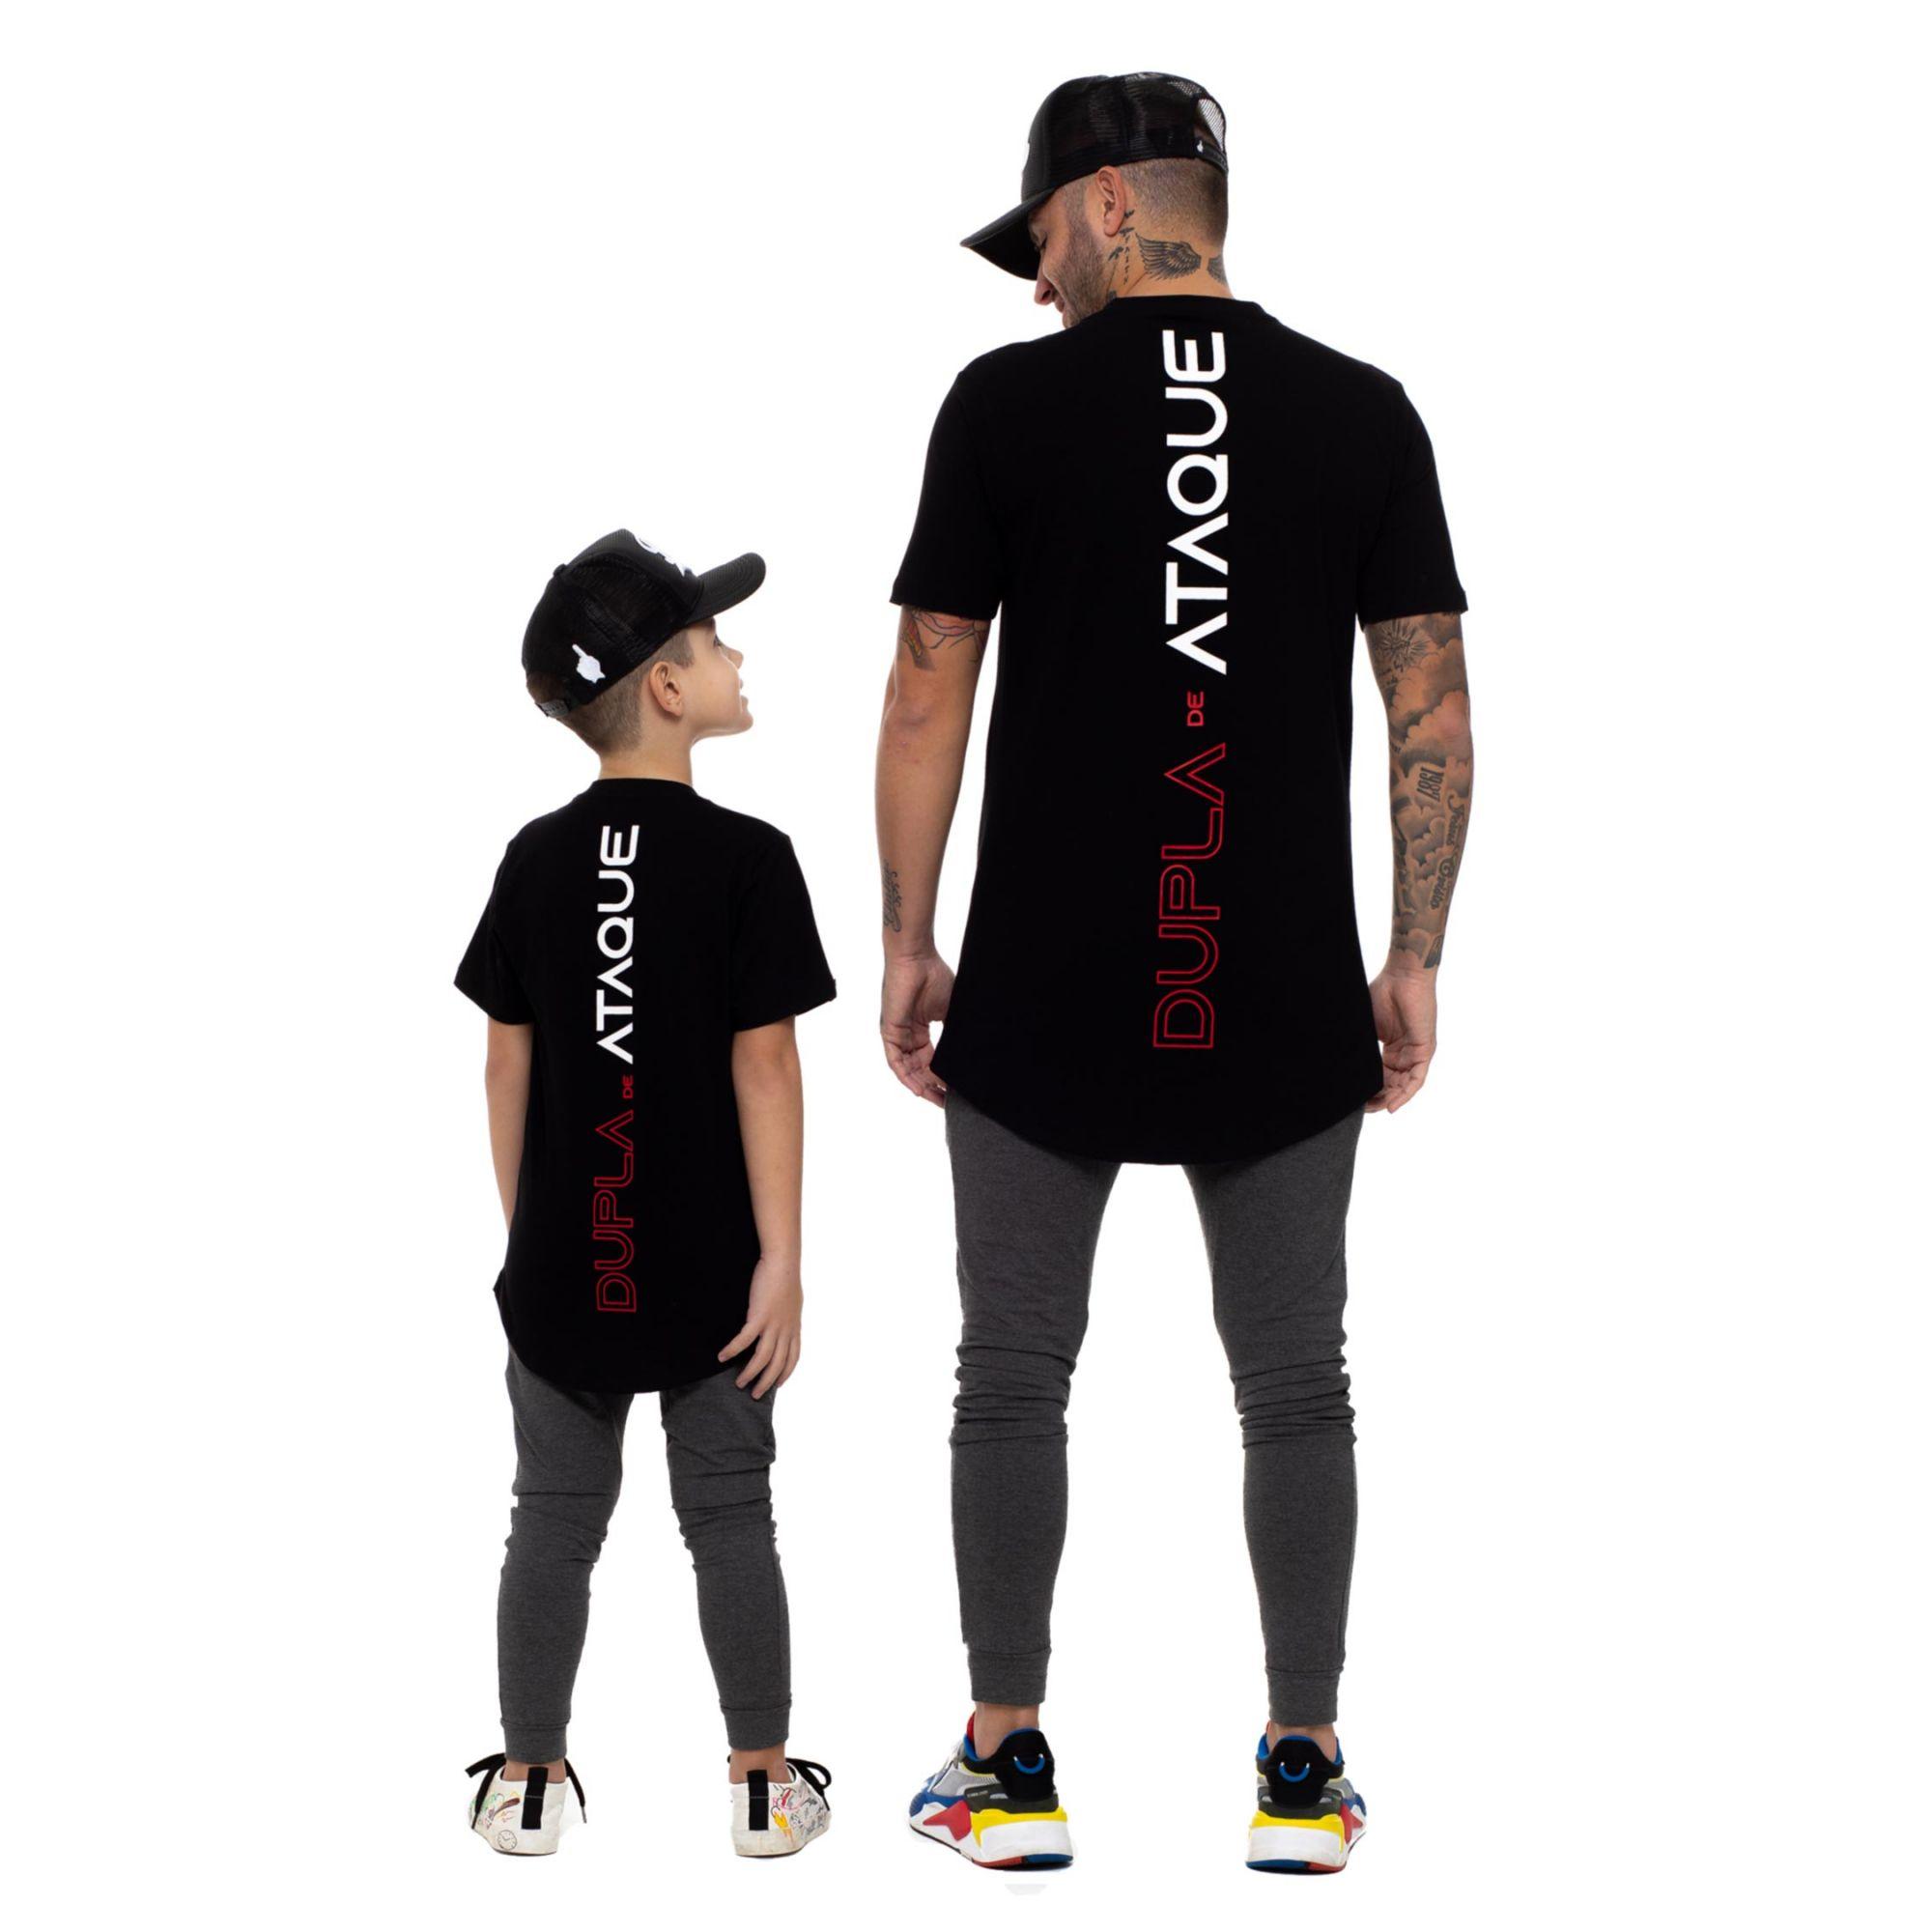 Camiseta Buh Dupla de Craque Black